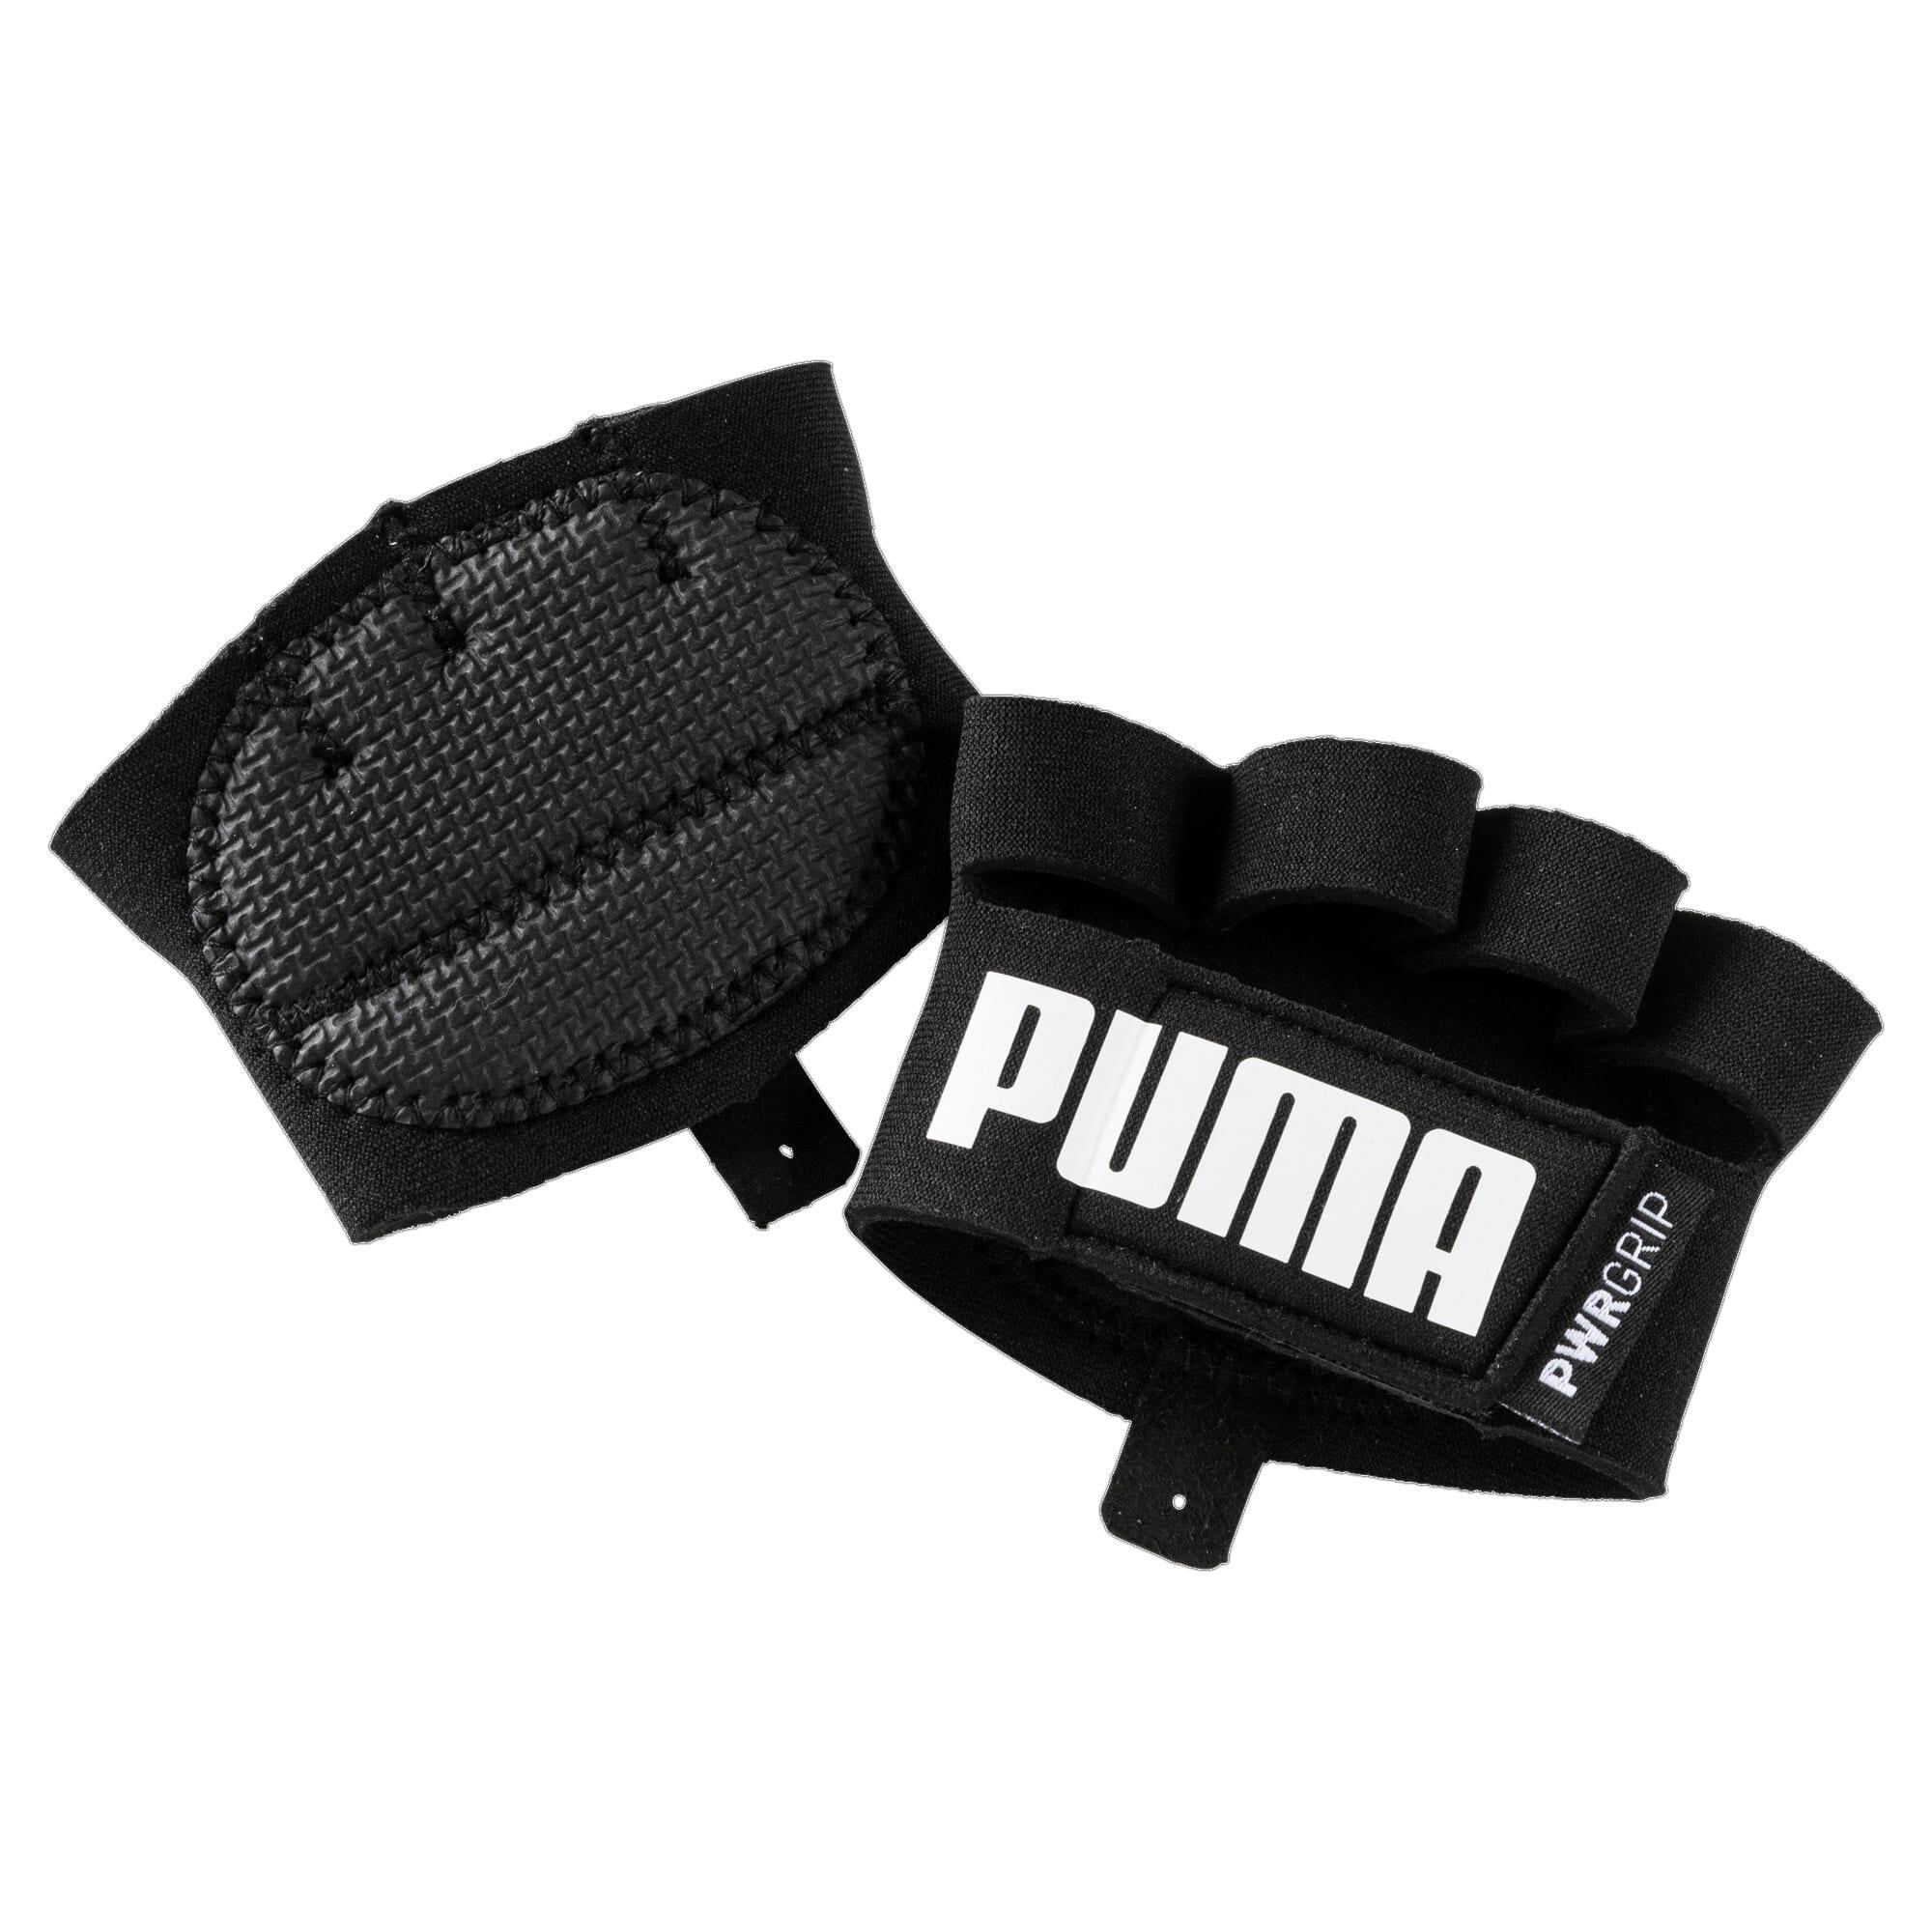 Thumbnail 1 of Gants Training Essential Grip, Puma Black-Puma White, medium